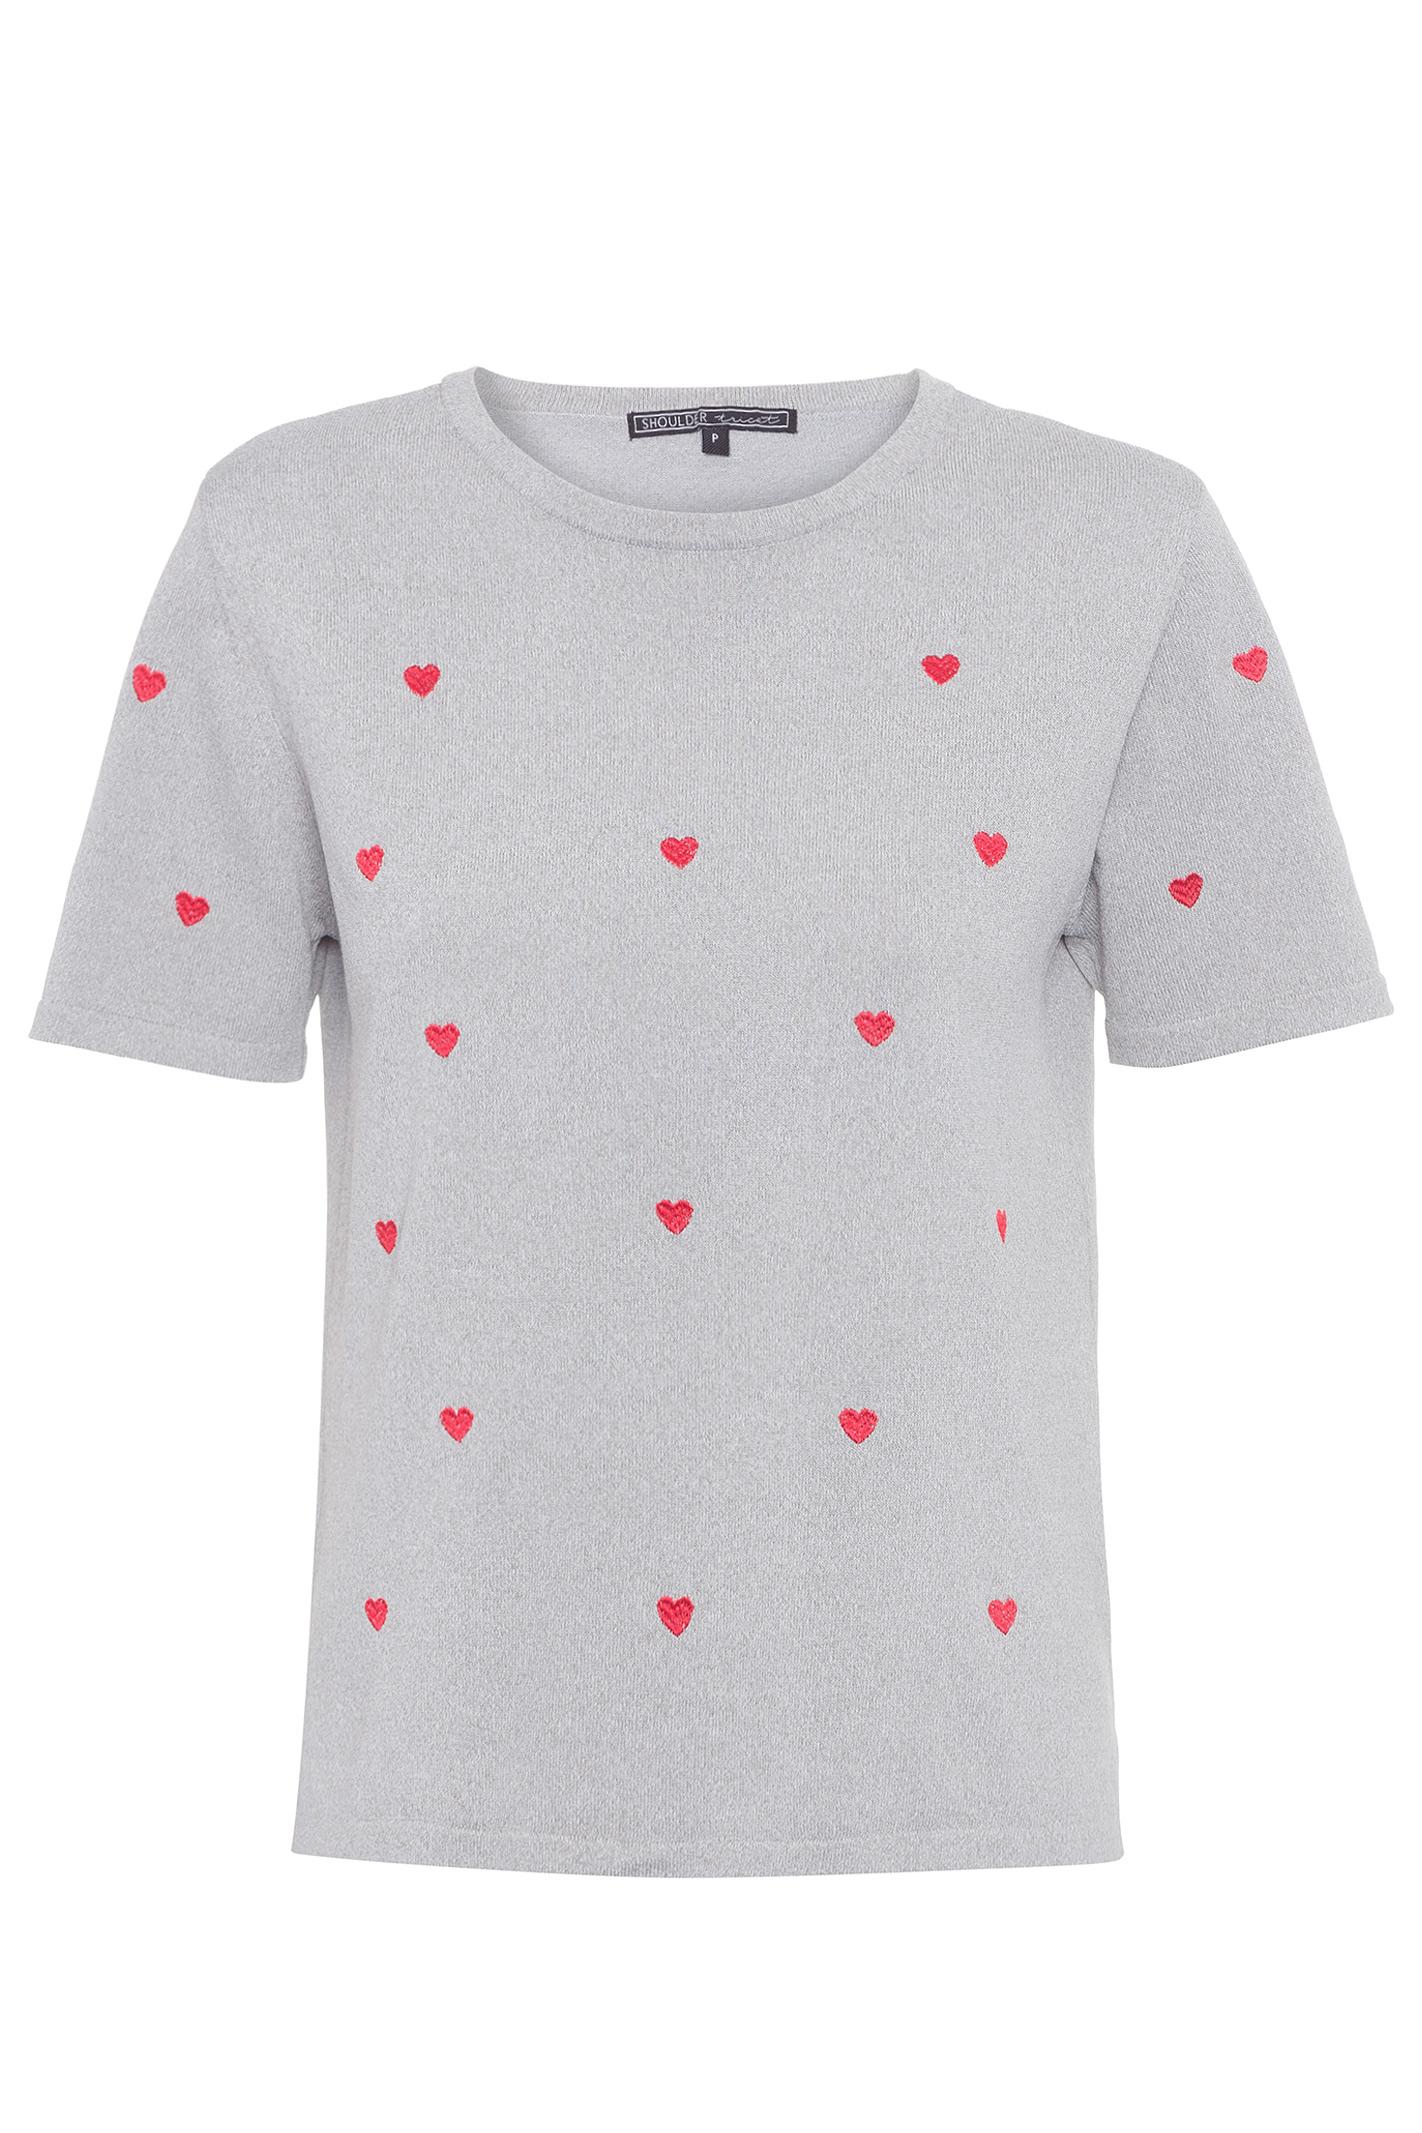 T-Shirt Tricot Mescla Bordada